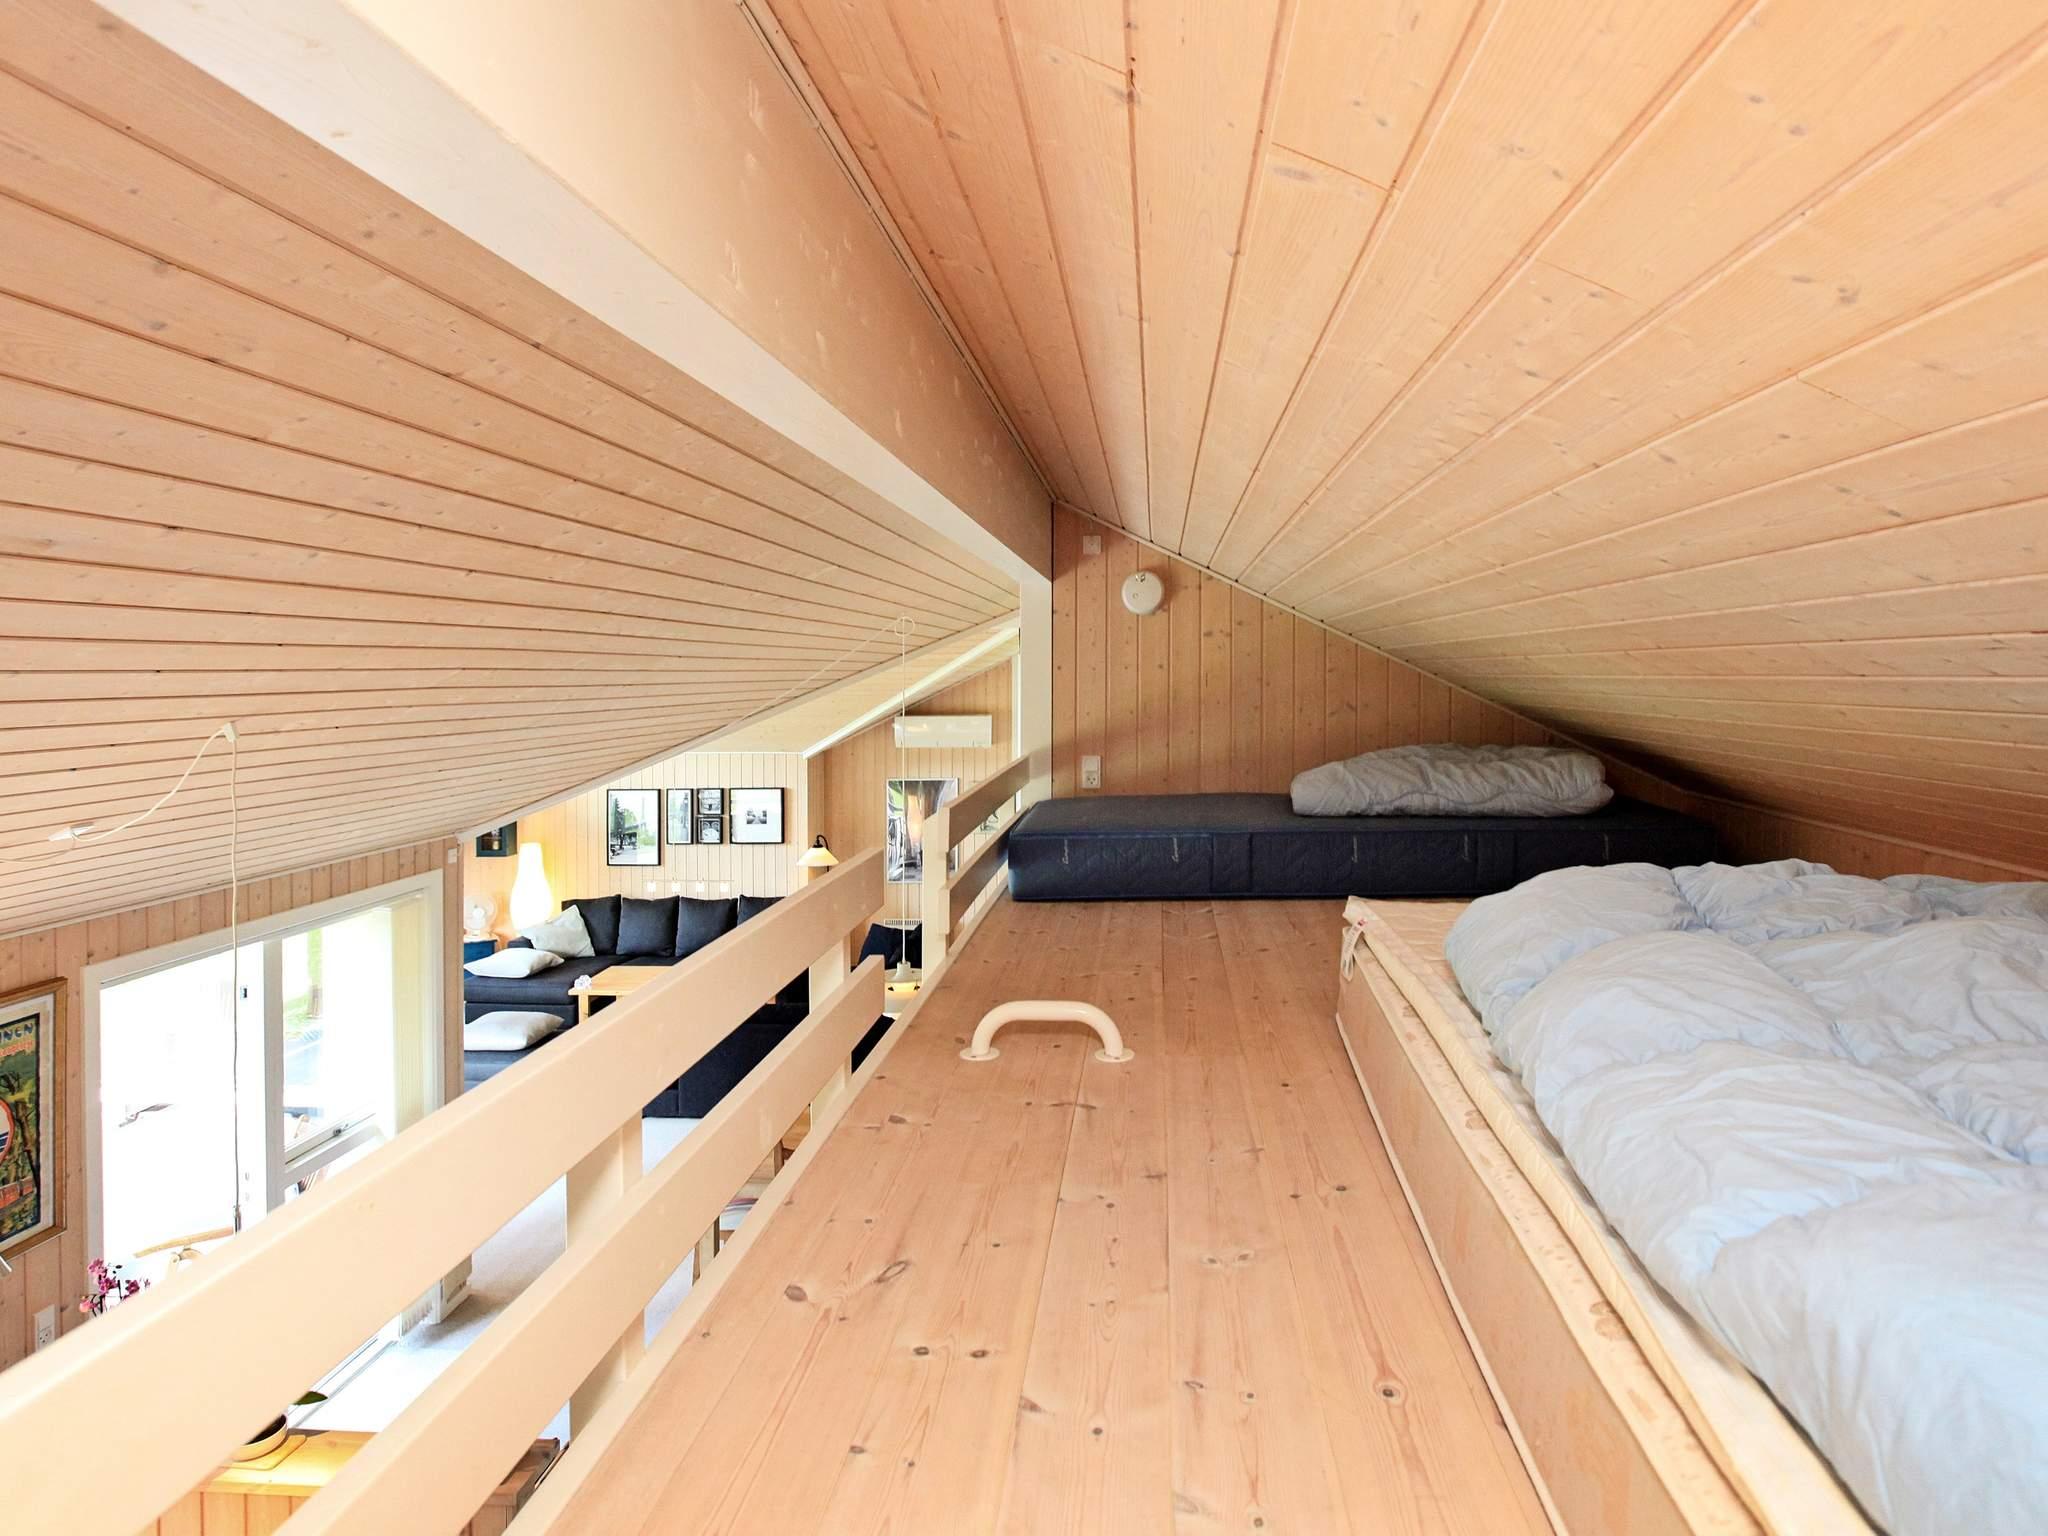 Ferienhaus Vejby Strand (681722), Vejby, , Nordseeland, Dänemark, Bild 8